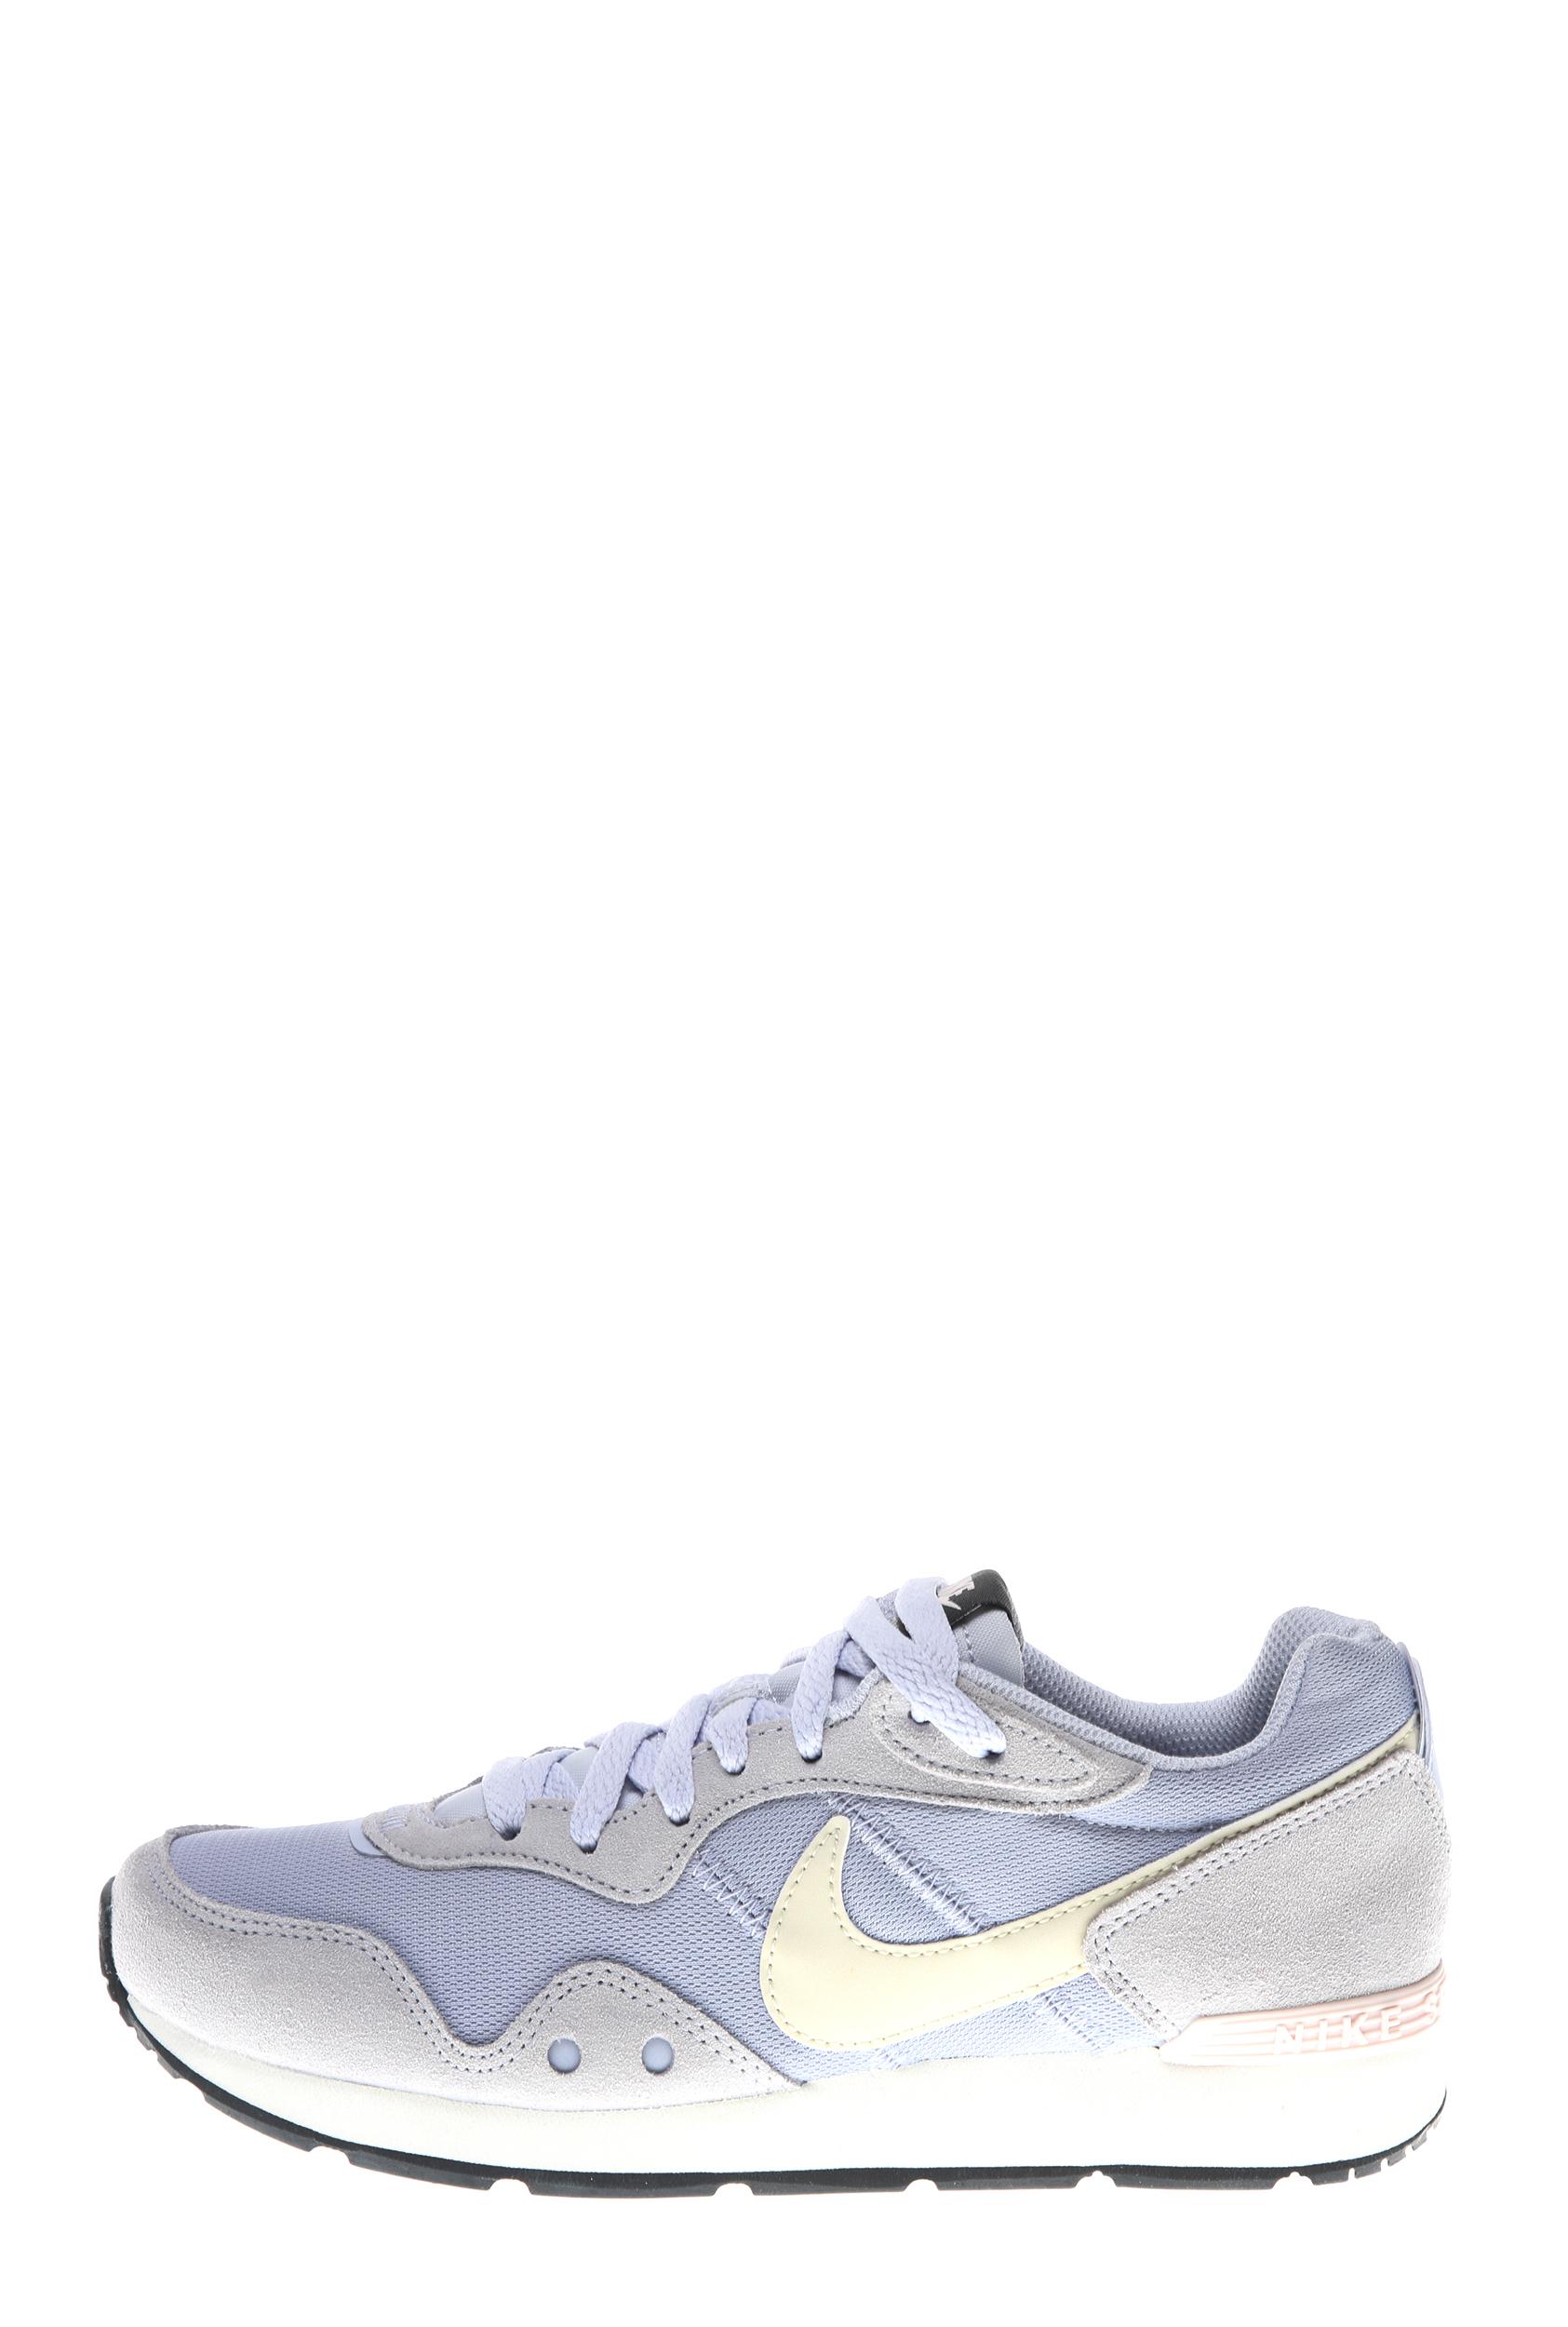 NIKE – Γυναικεία αθλητικά παπούτσια WMNS NIKE VENTURE RUNNER γκρί